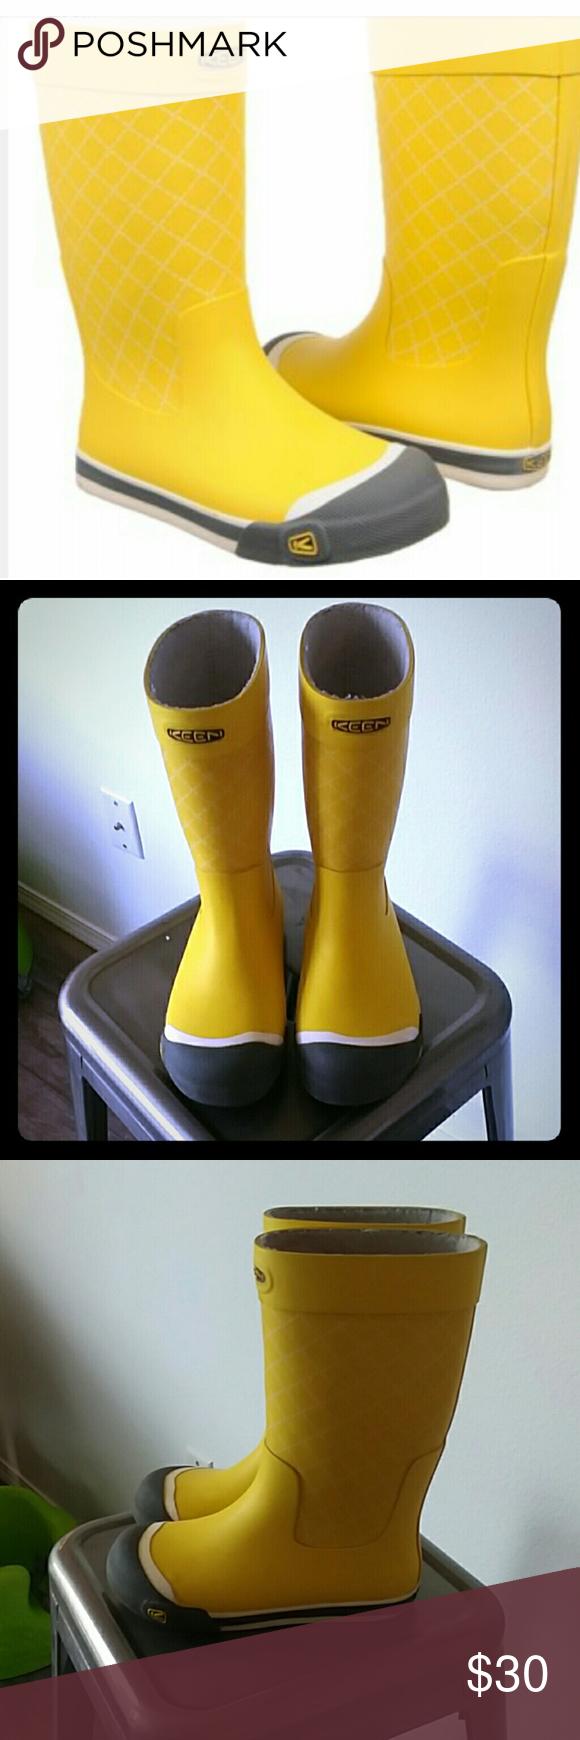 74b82d78b4ef Keen mimosa women s Coronado Rainboots Yellow Keen rain boots US size 5 In  good used condition